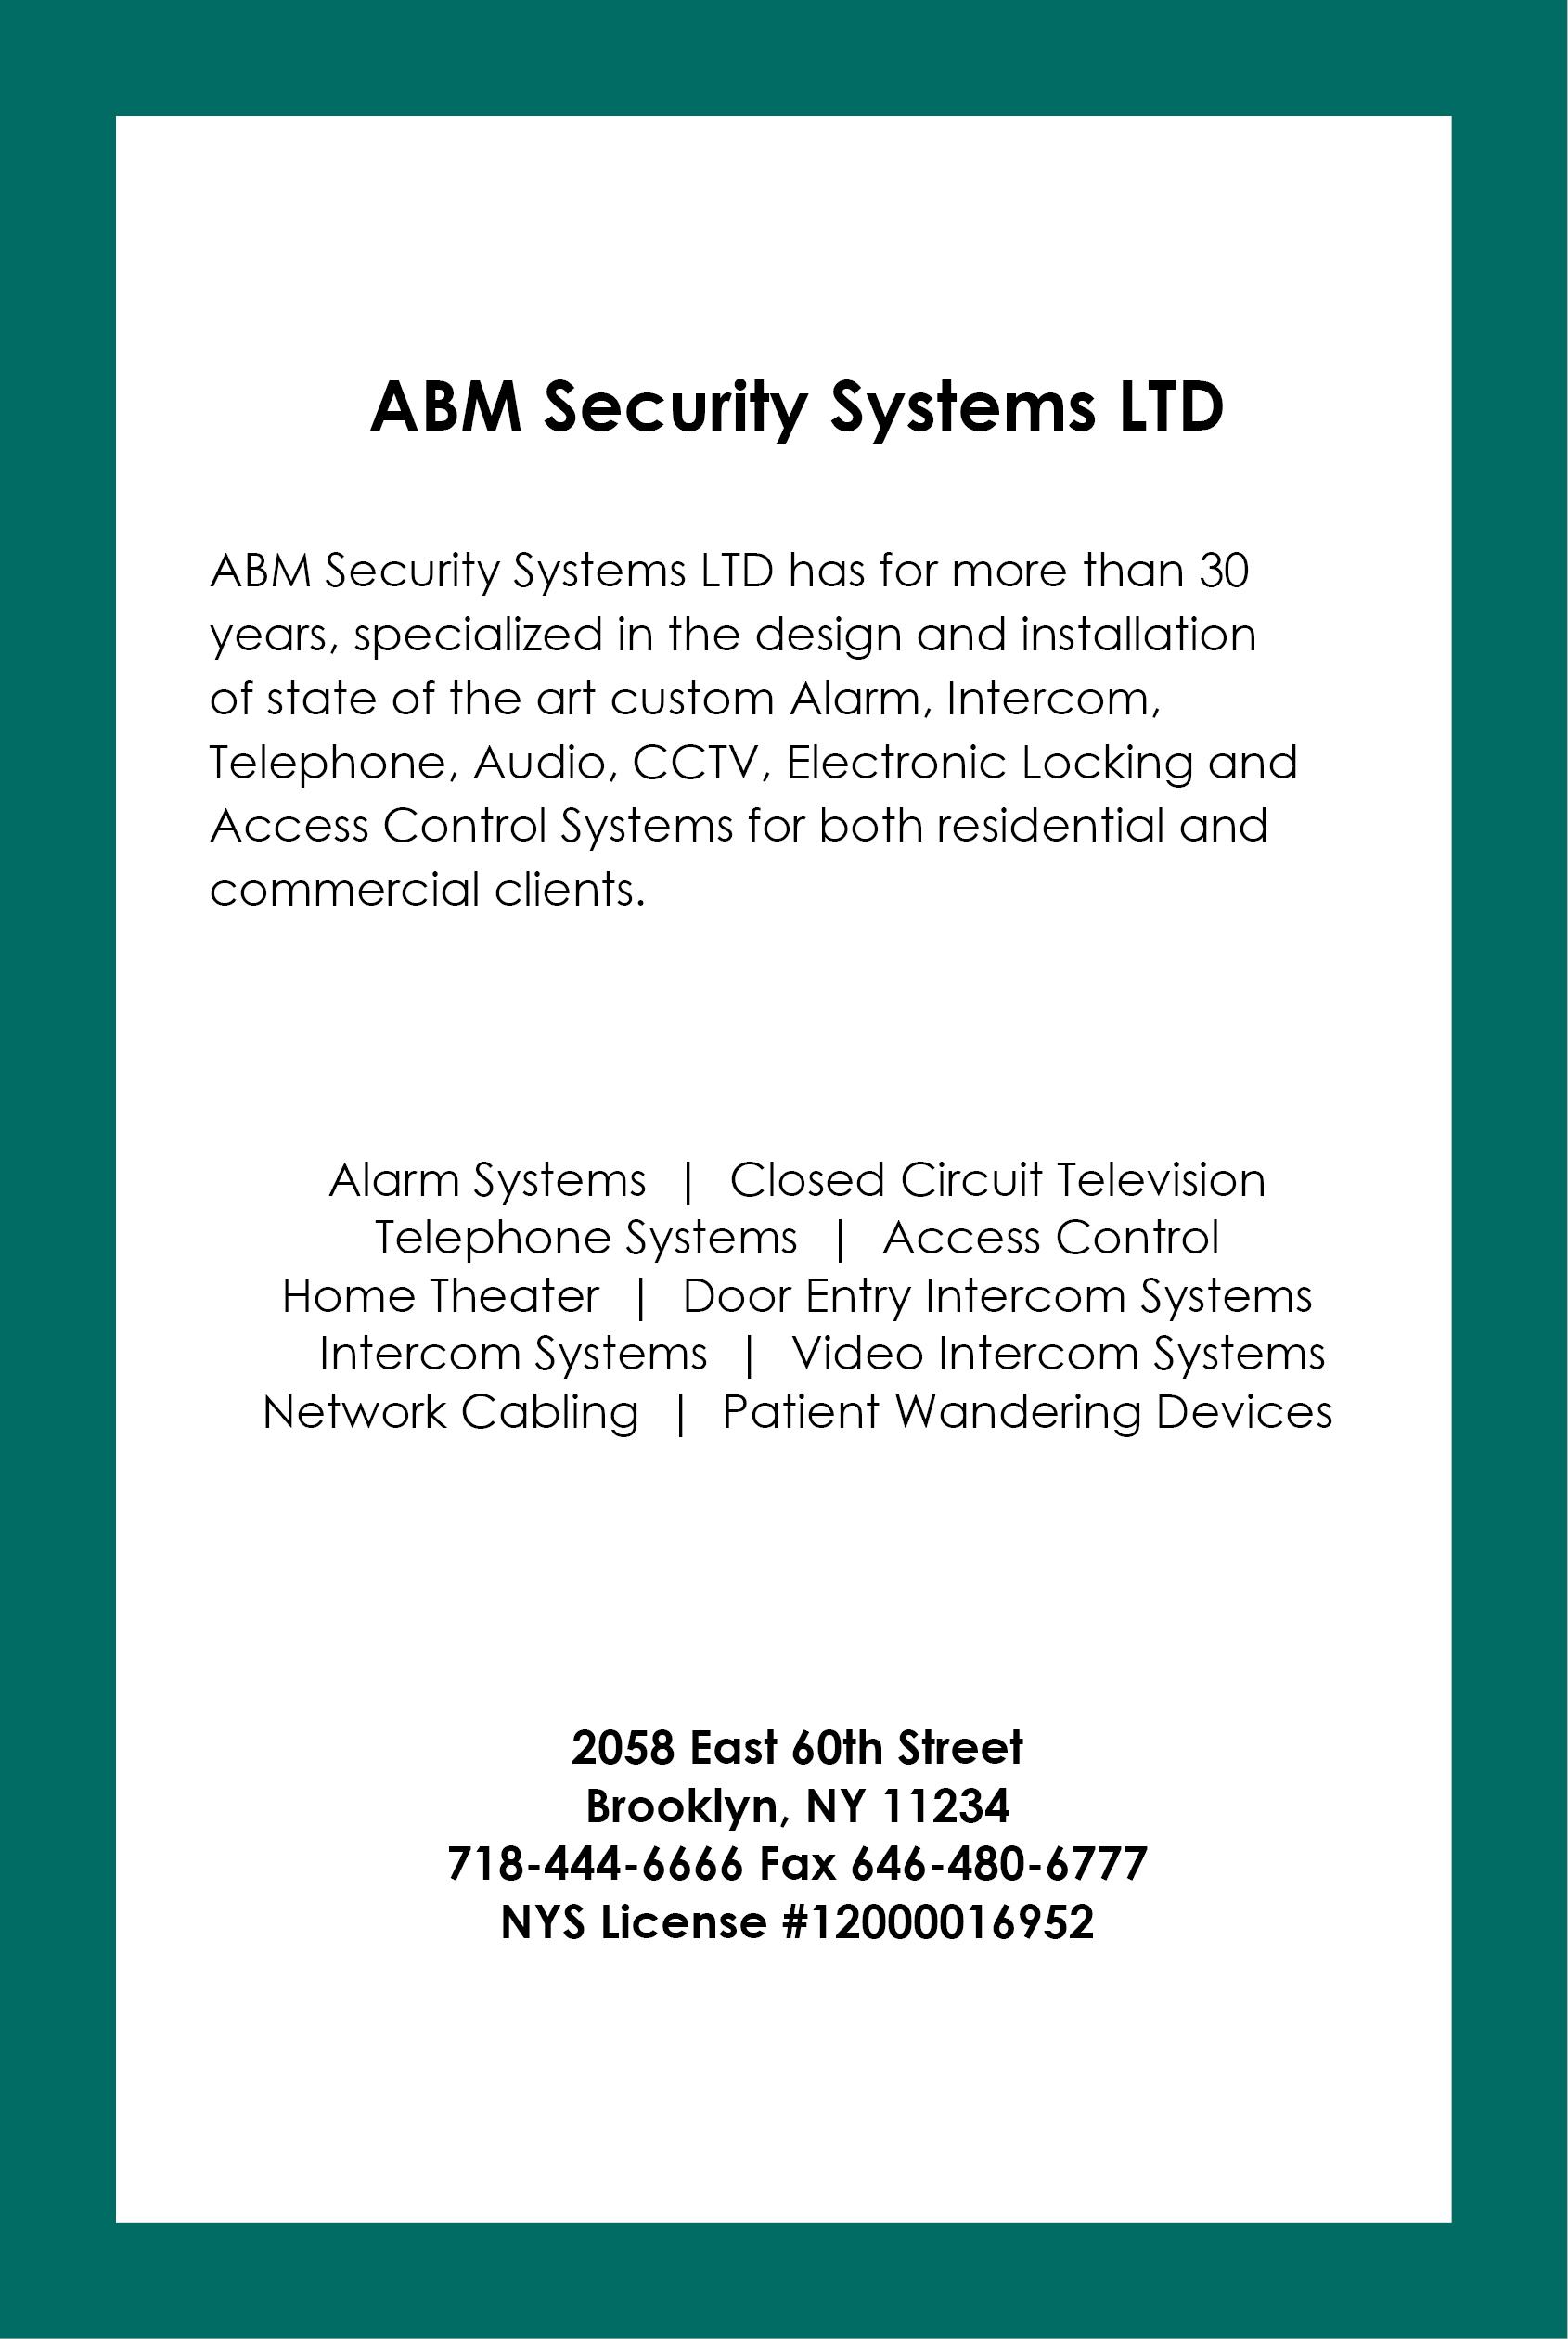 Full page - ABM.jpg